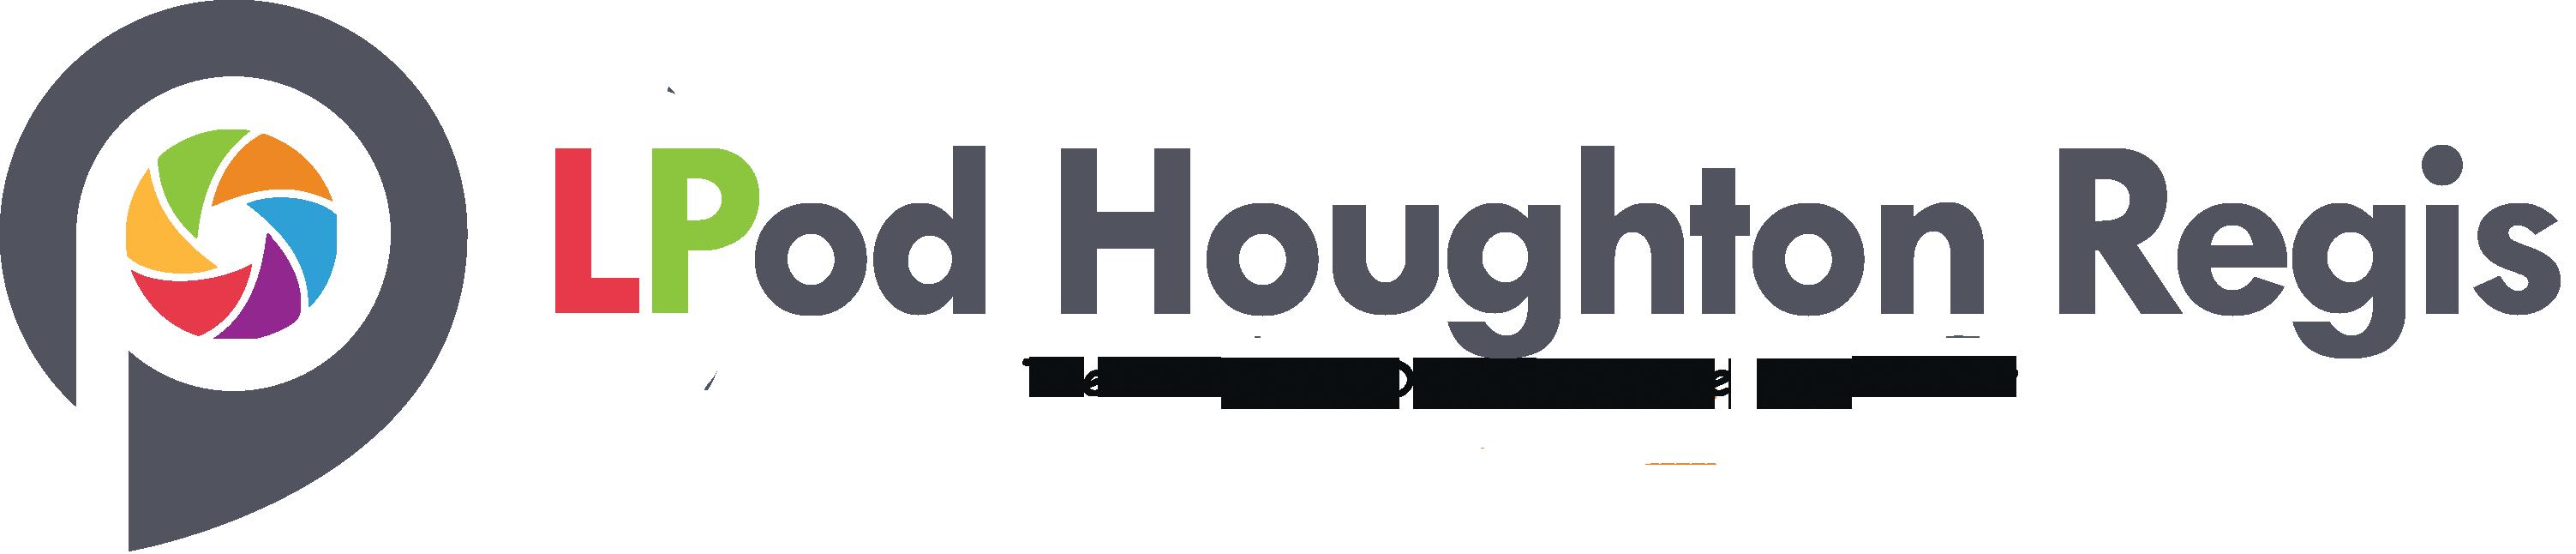 intensive driving courses Houghton Regis